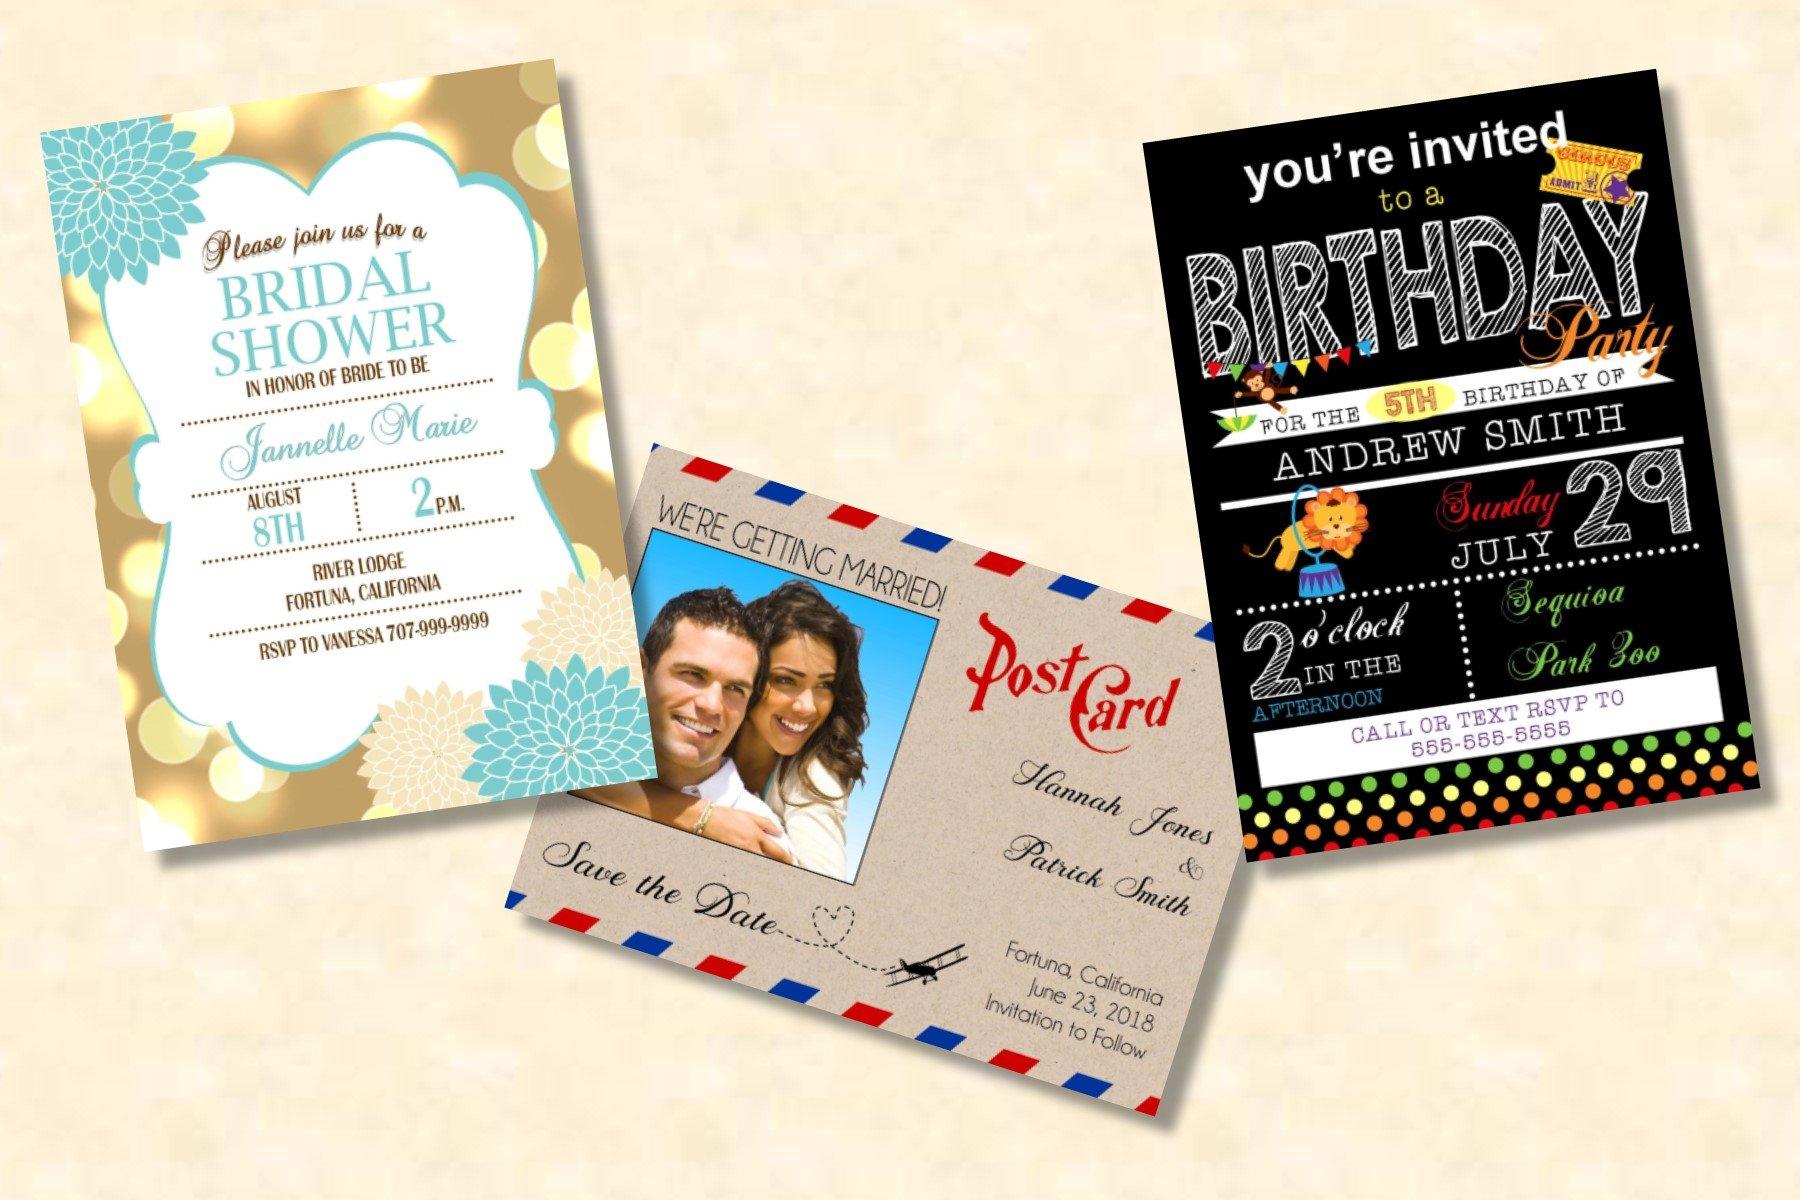 Postcard & Invitation Black Printing Options Full Bleed Pricing 5x7